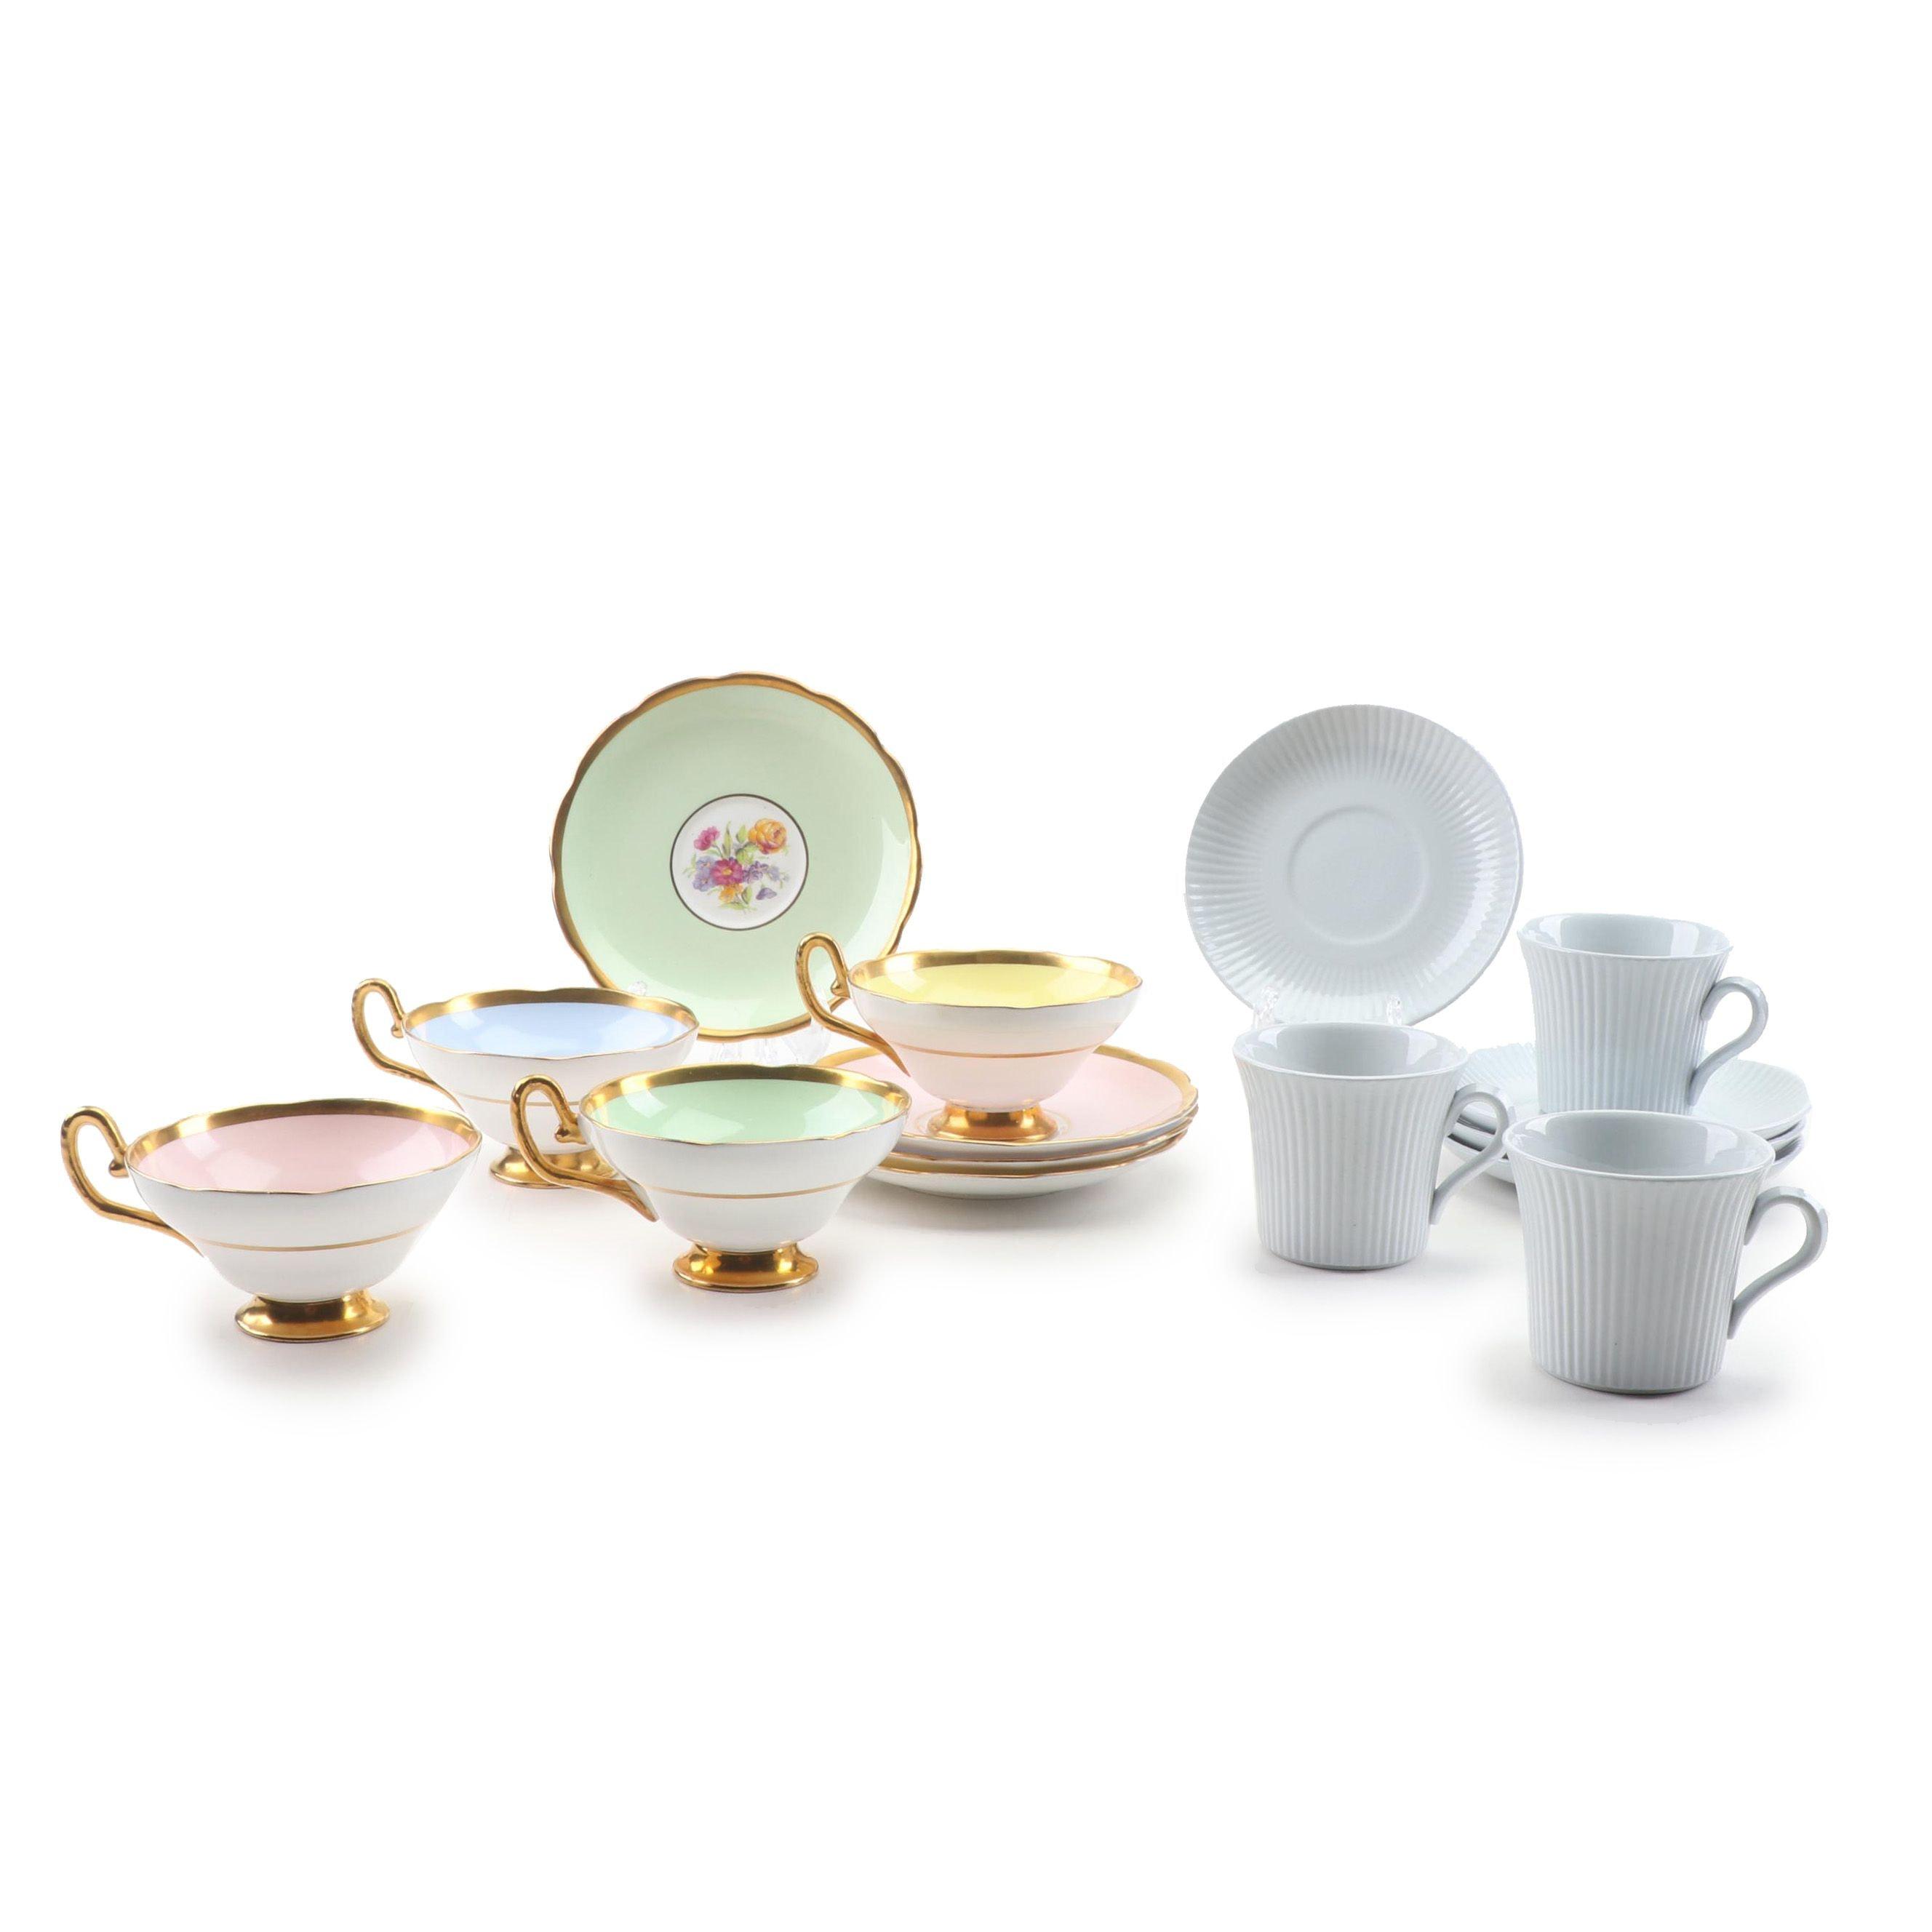 Taylor & Kent Gold Trim Bone China and Ribbed Ceramic Teacups and Saucers